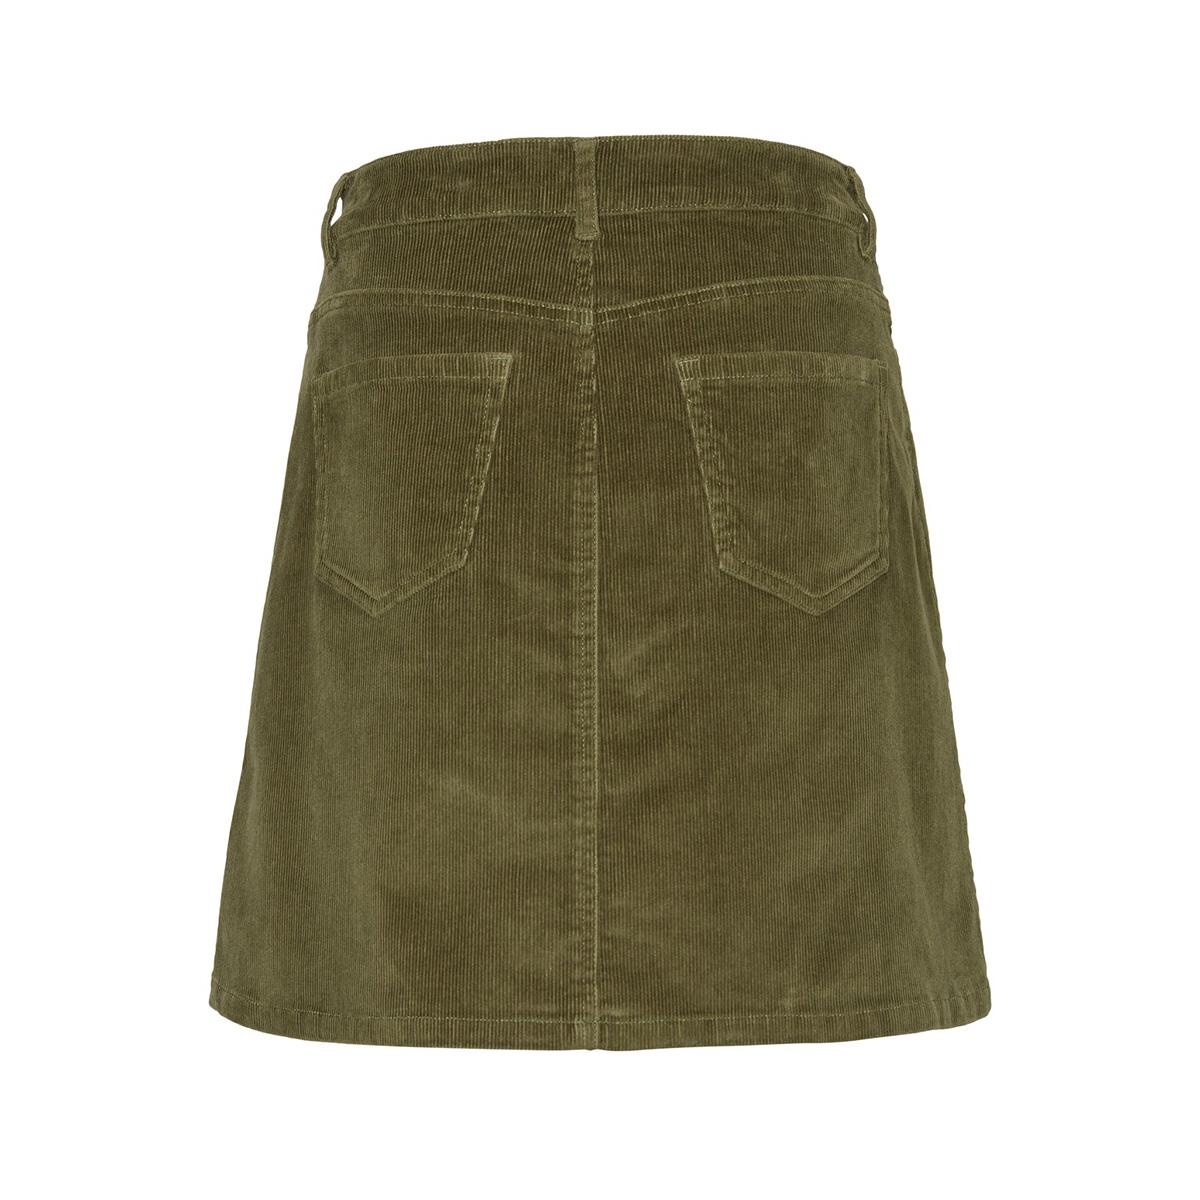 nmsunny short corduroy skirt noos 27008506 noisy may rok olivine